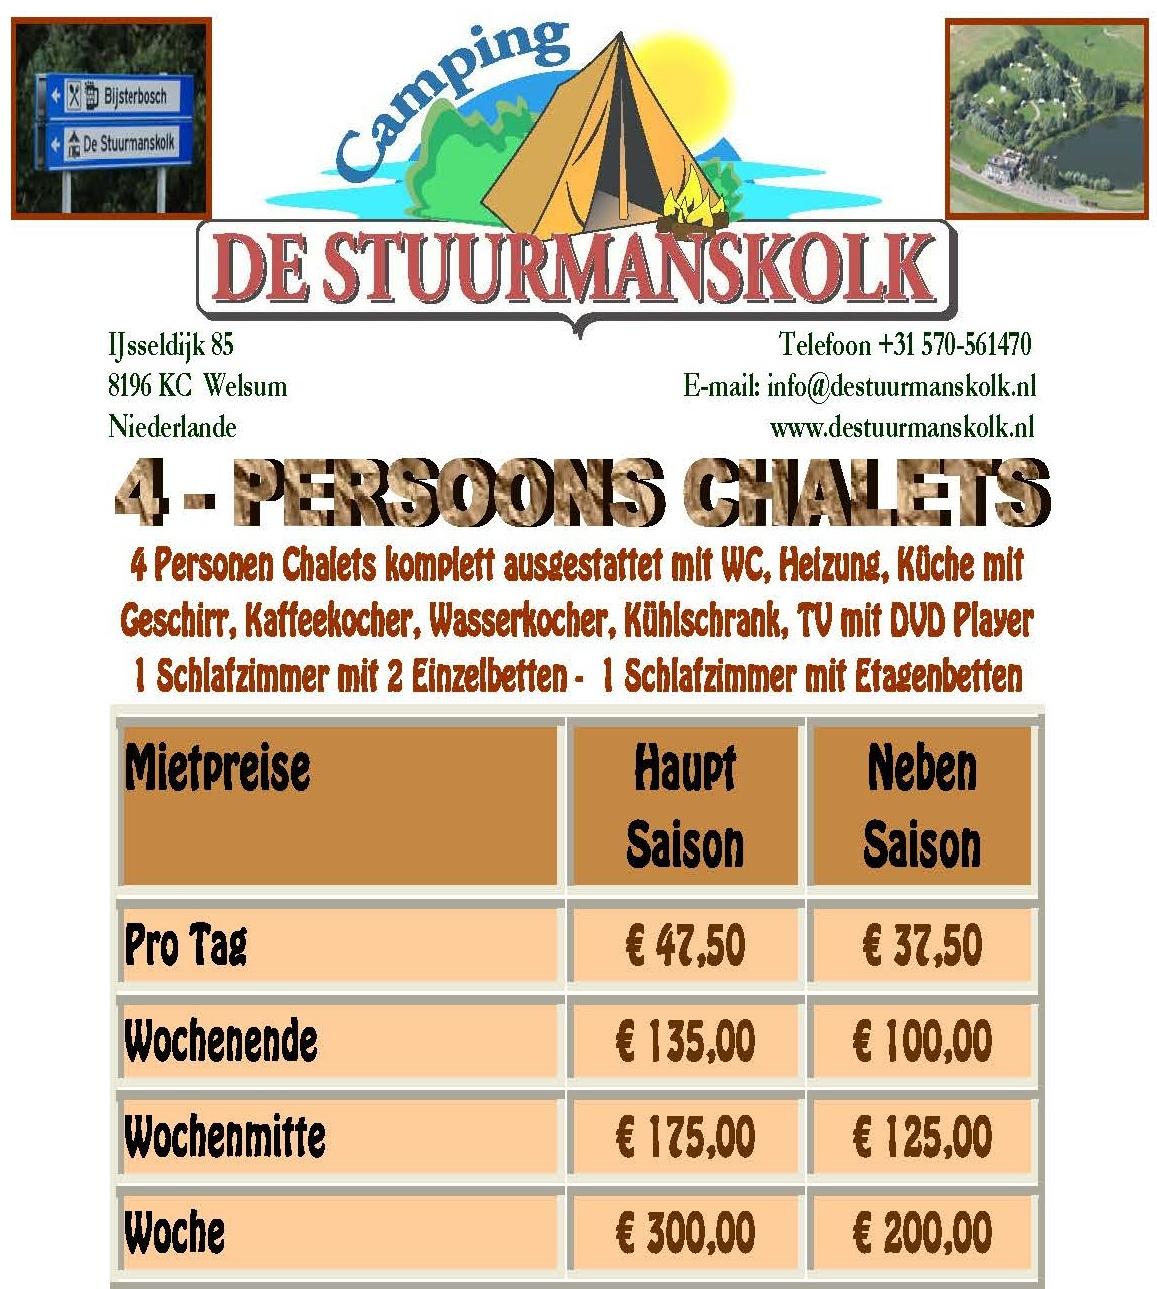 Prijzen camping 2013 duits1